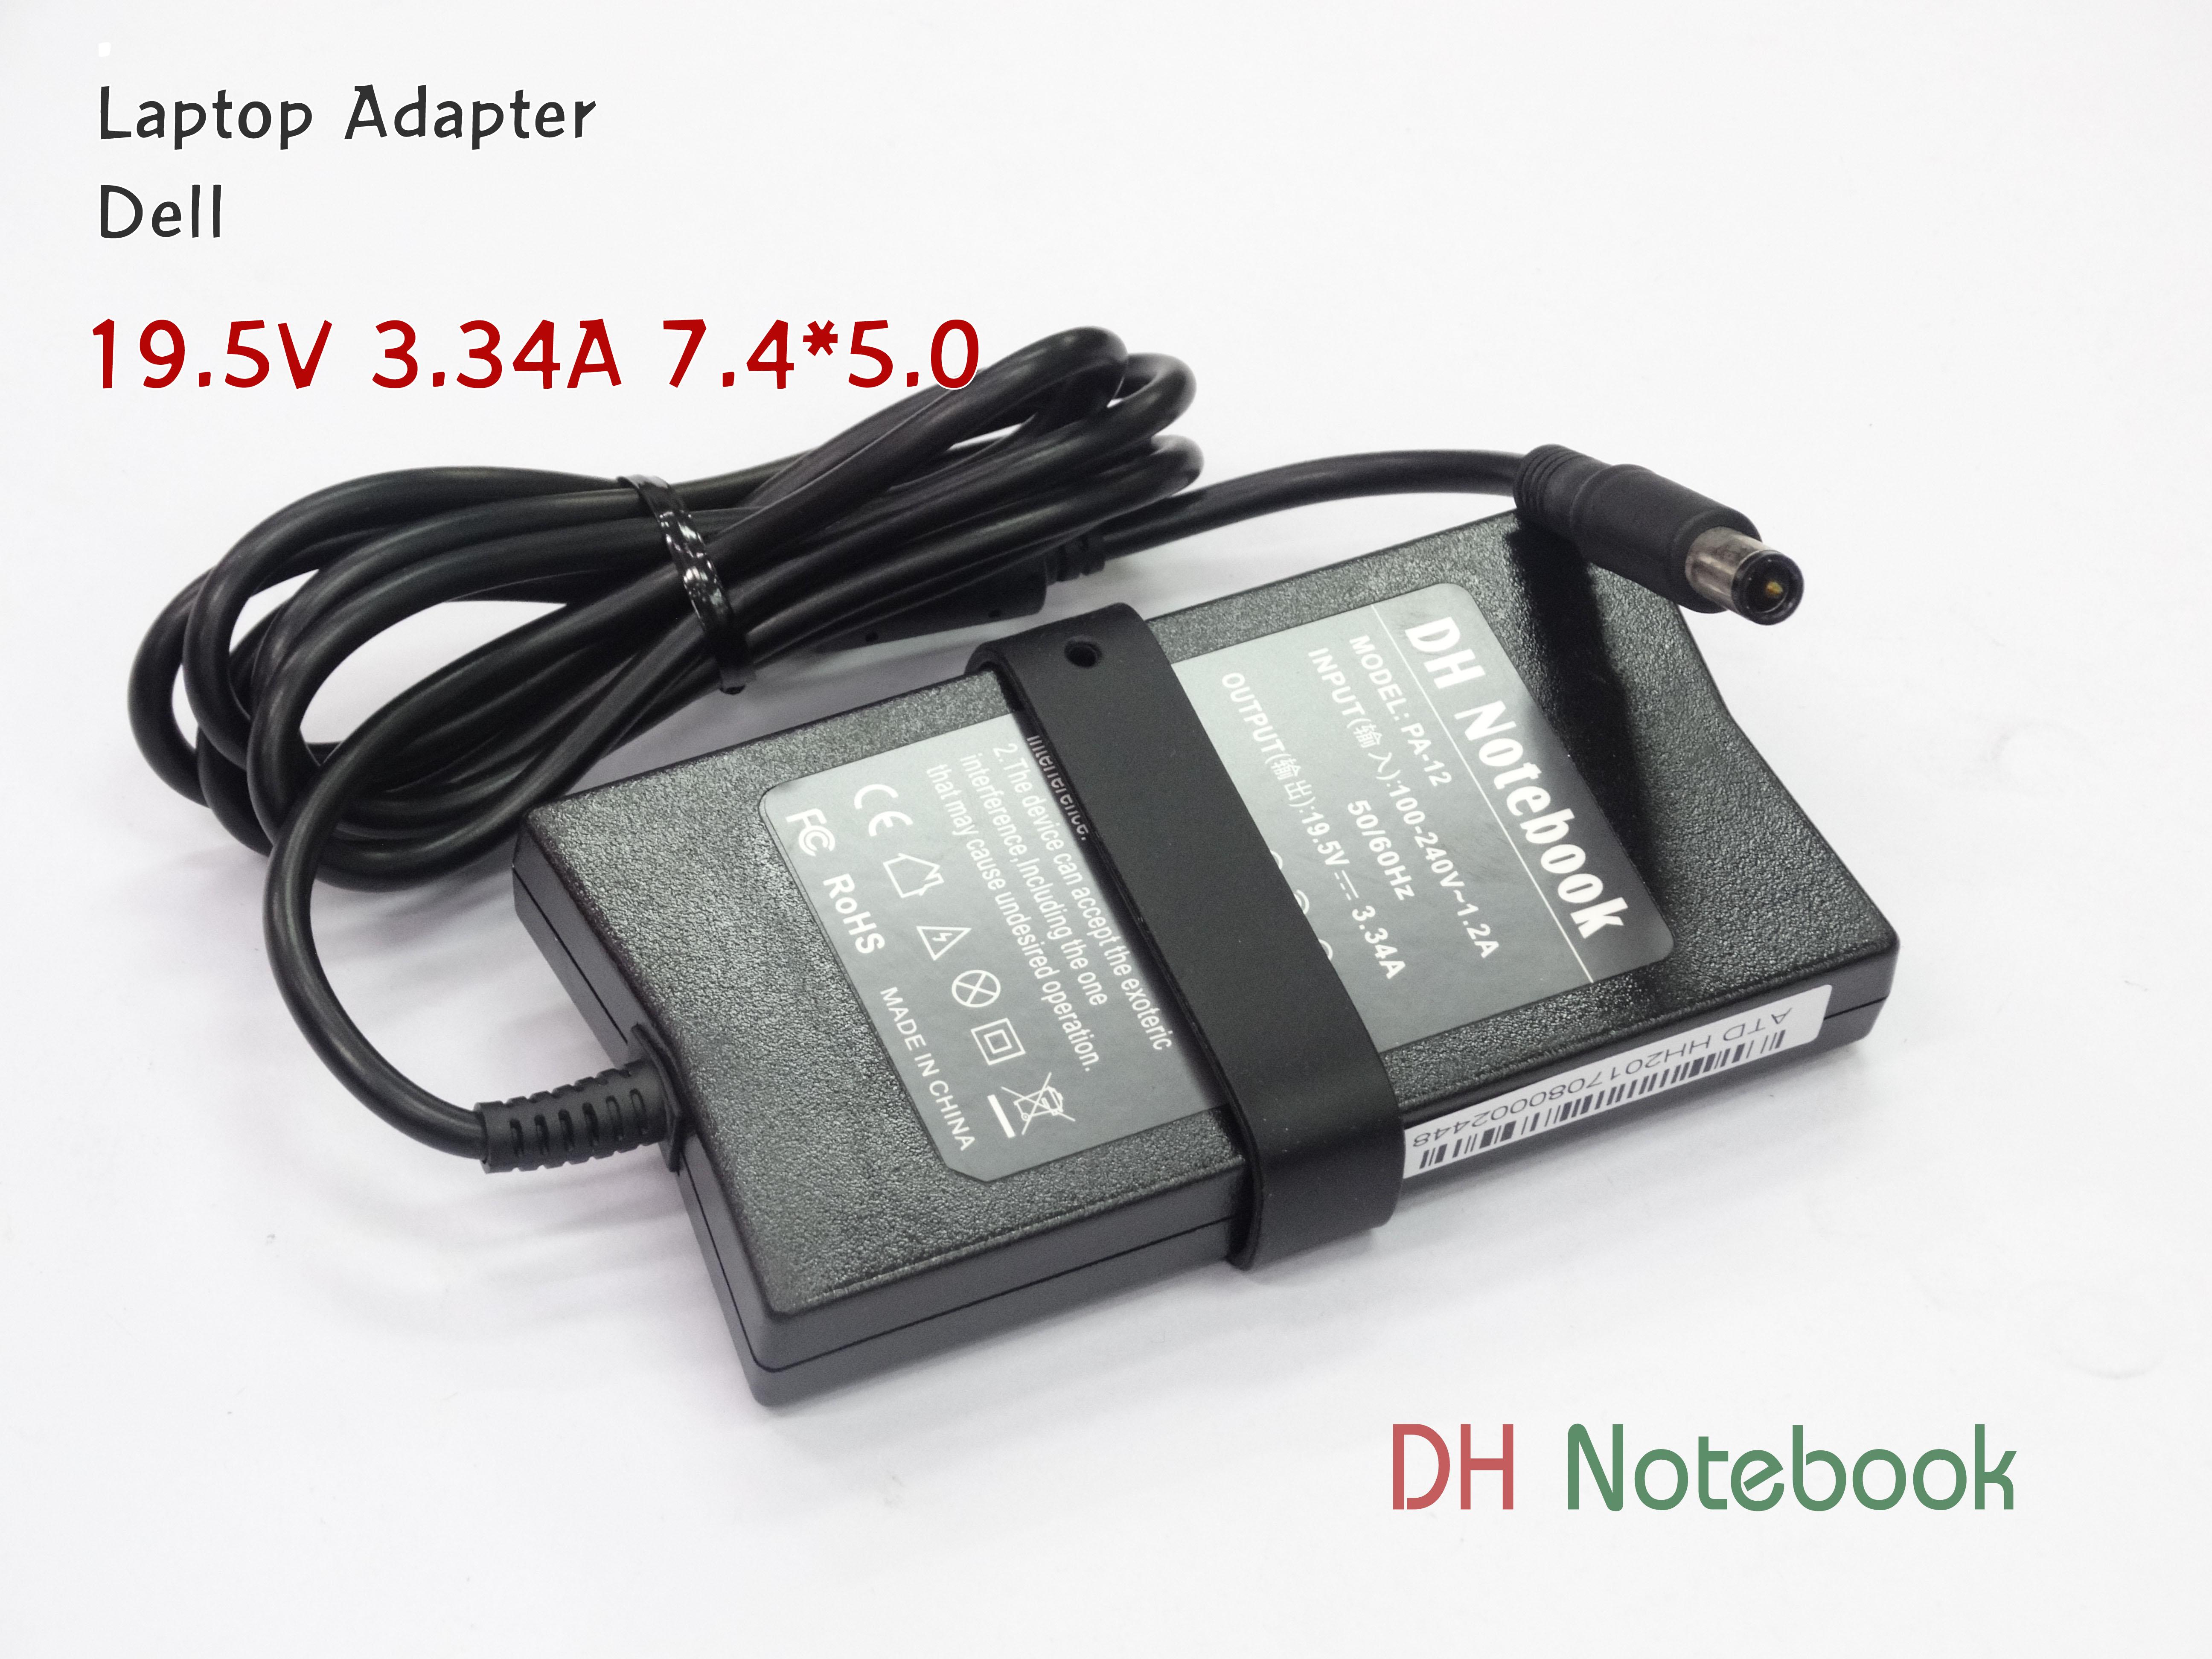 Adapter For Dell 19.5V 3.34A (7.4*5.0) Slim